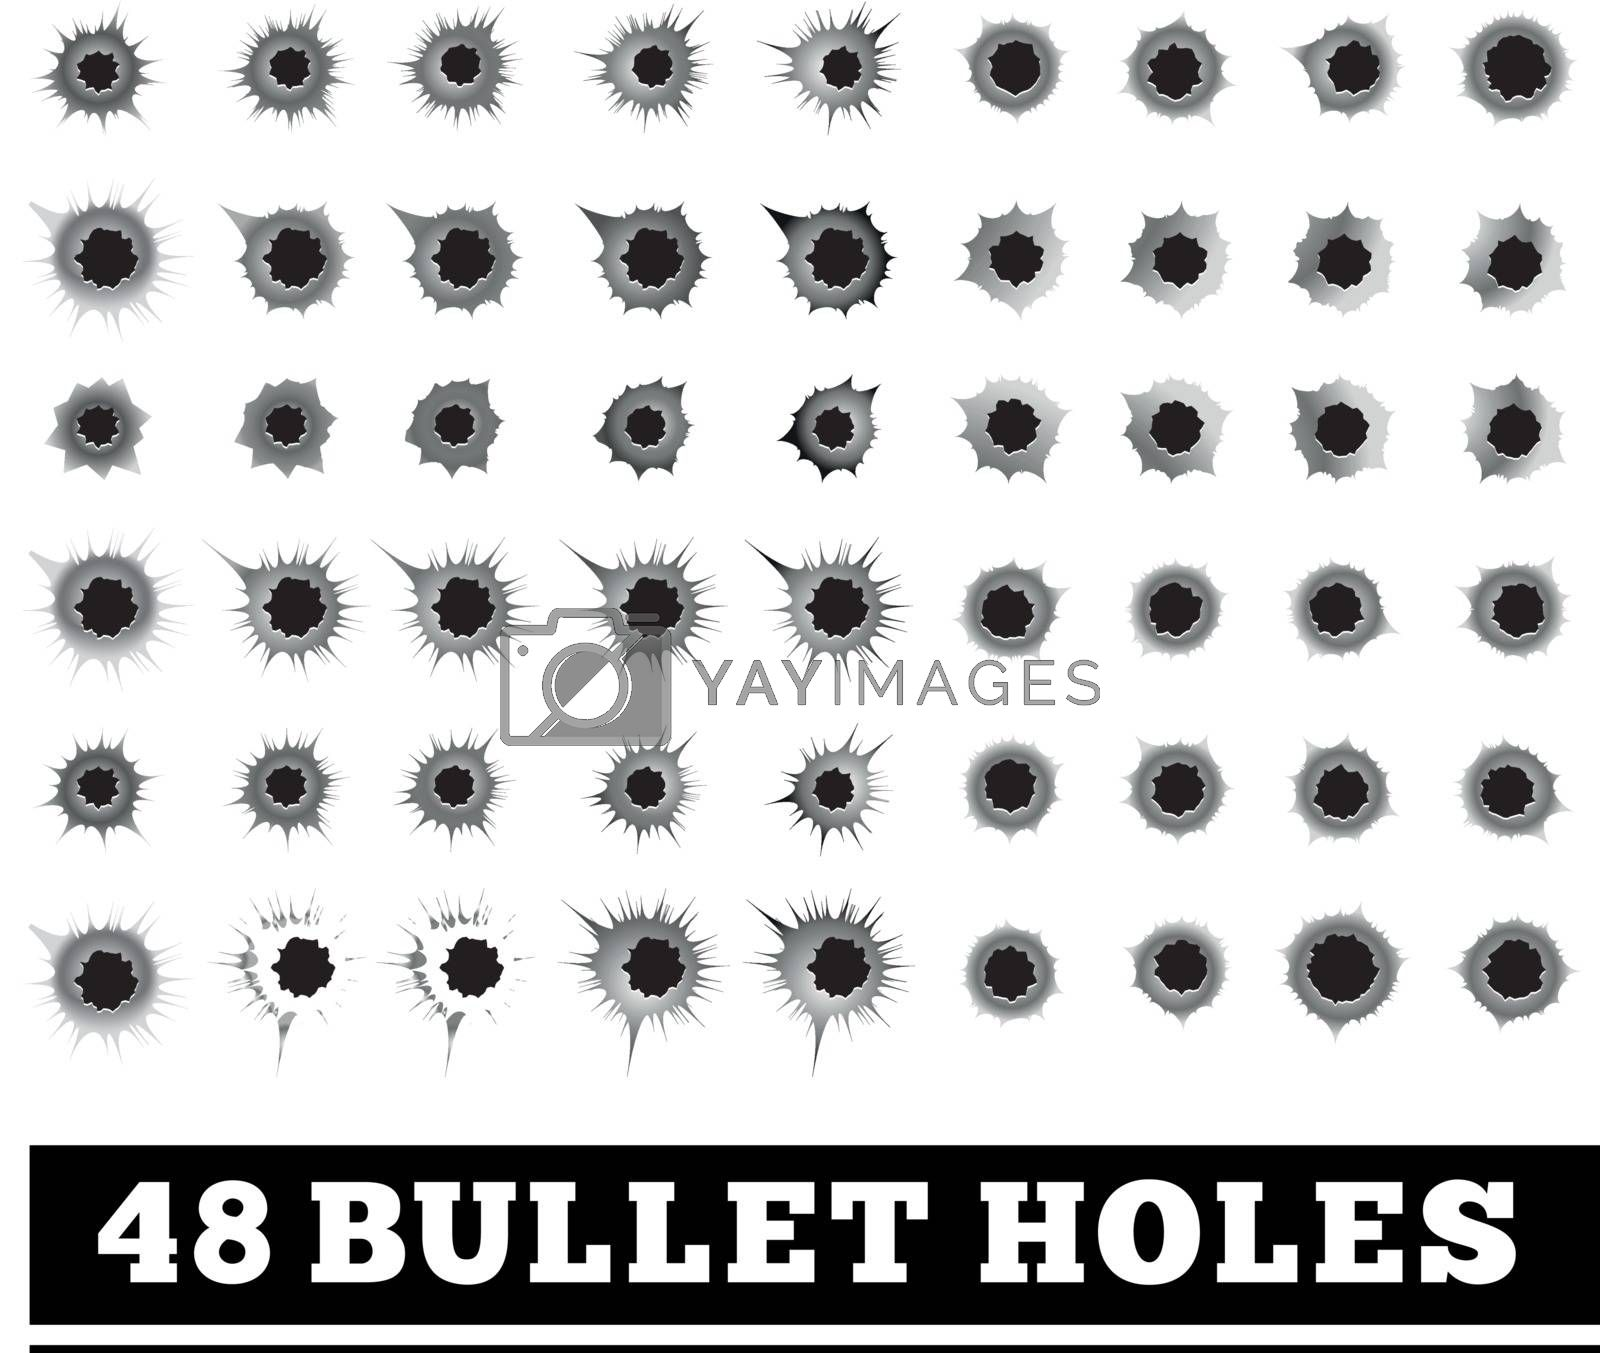 Bullet holes vector illustration on white background.